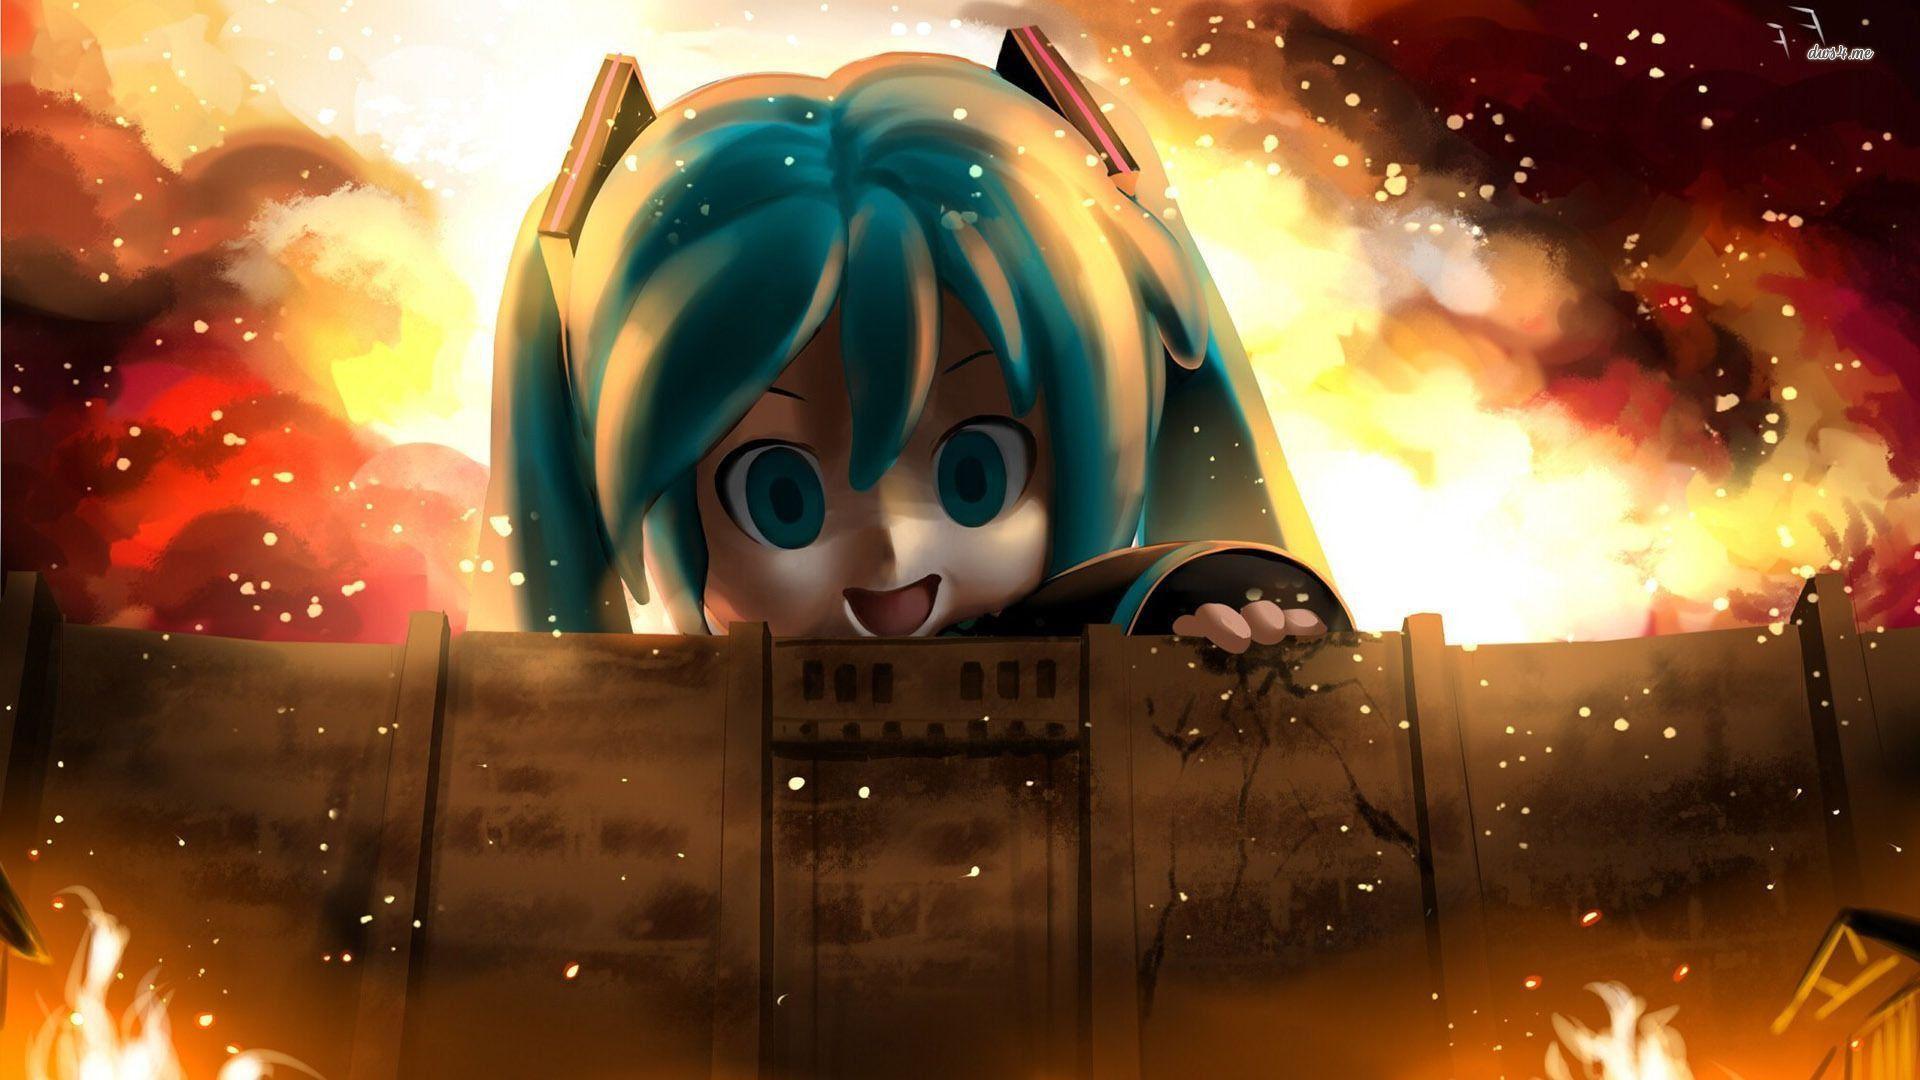 Attack On Titan Wallpaper 4k Desktop Lovely Attack Titan Desktop Wallpapers Top Free Attack O En 2020 Kyojin Shingeki No Kyojin